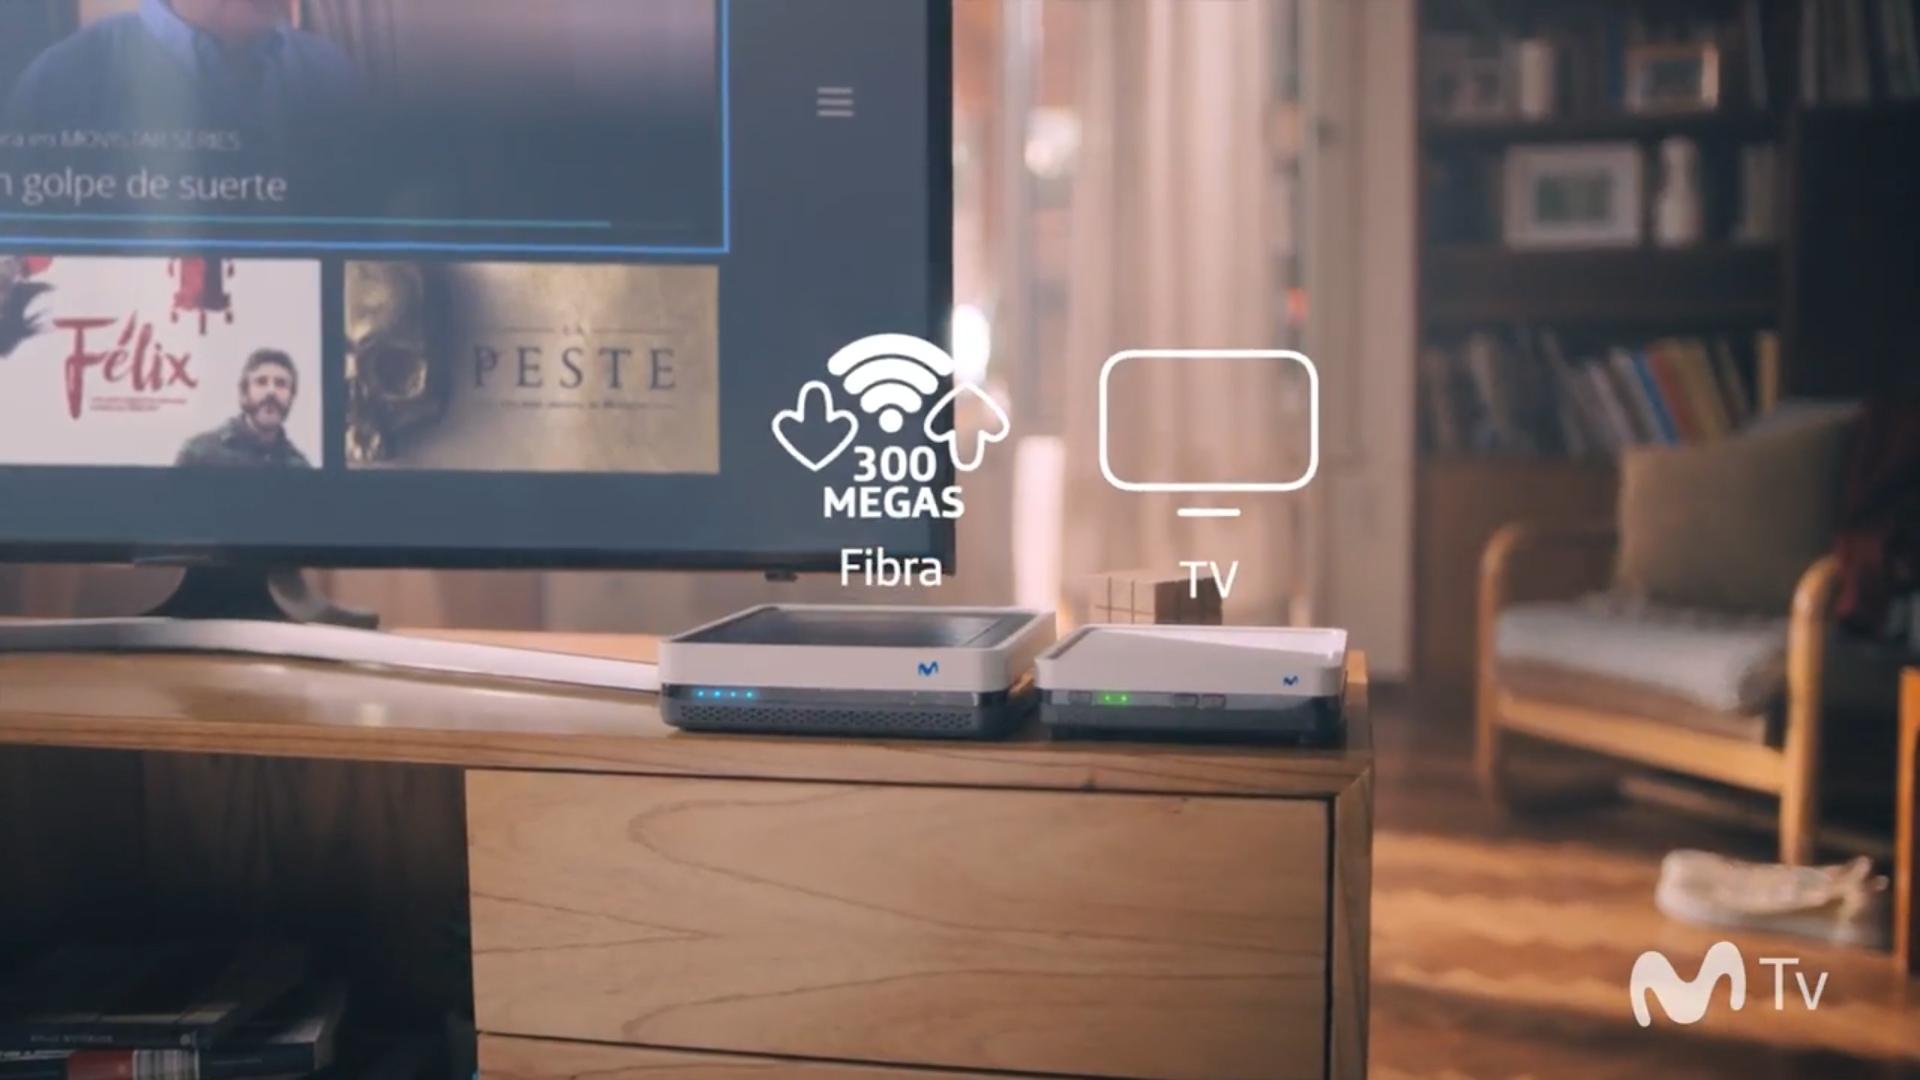 Todo sobre Movistar TV Argentina | EL DESTAQUE